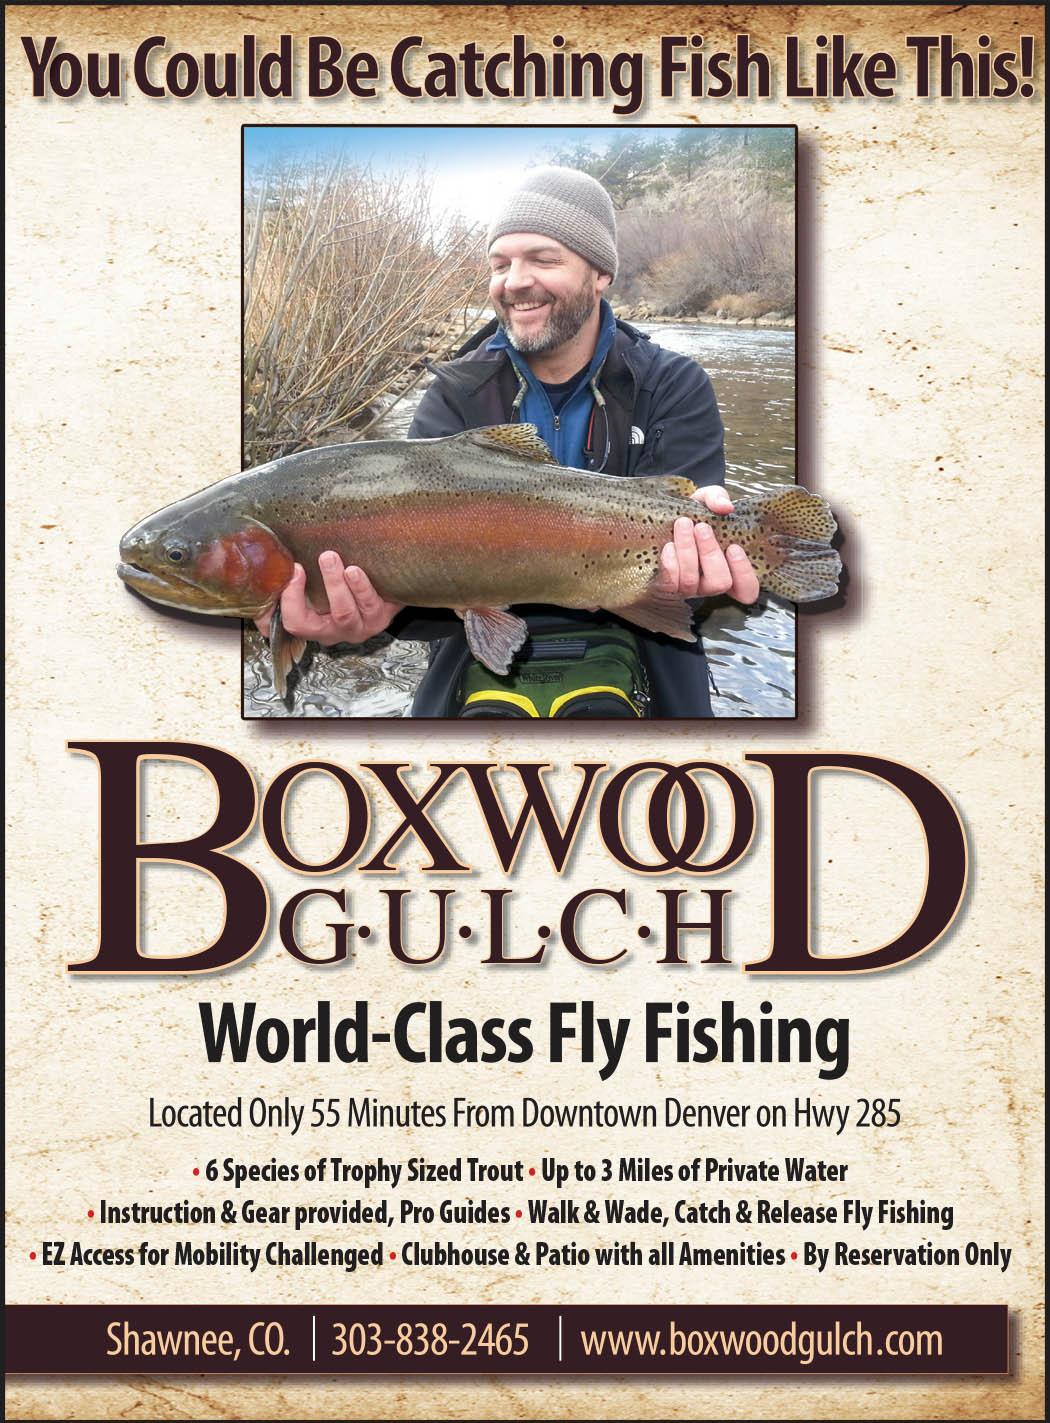 Boxwood Gulch